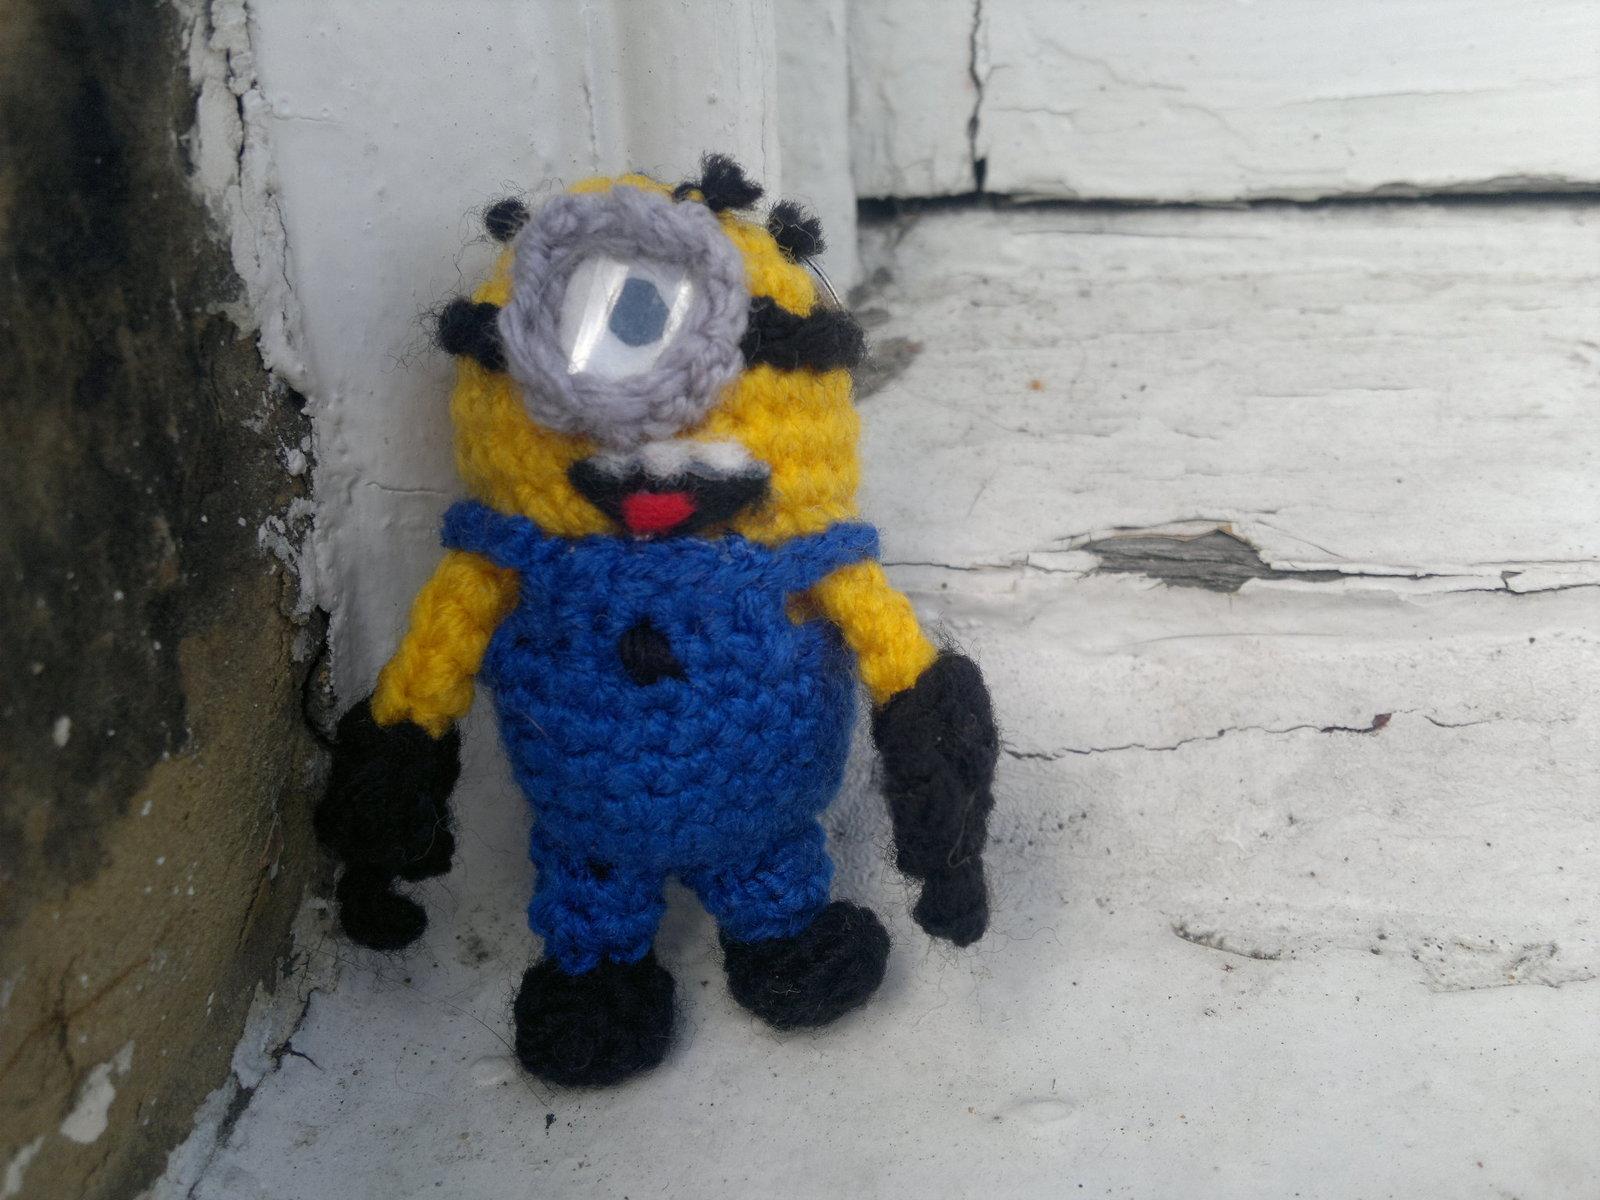 Volpe Portachiavi Amigurumi Tutorial 🦊 Fox Keychain Crochet ...   1200x1600